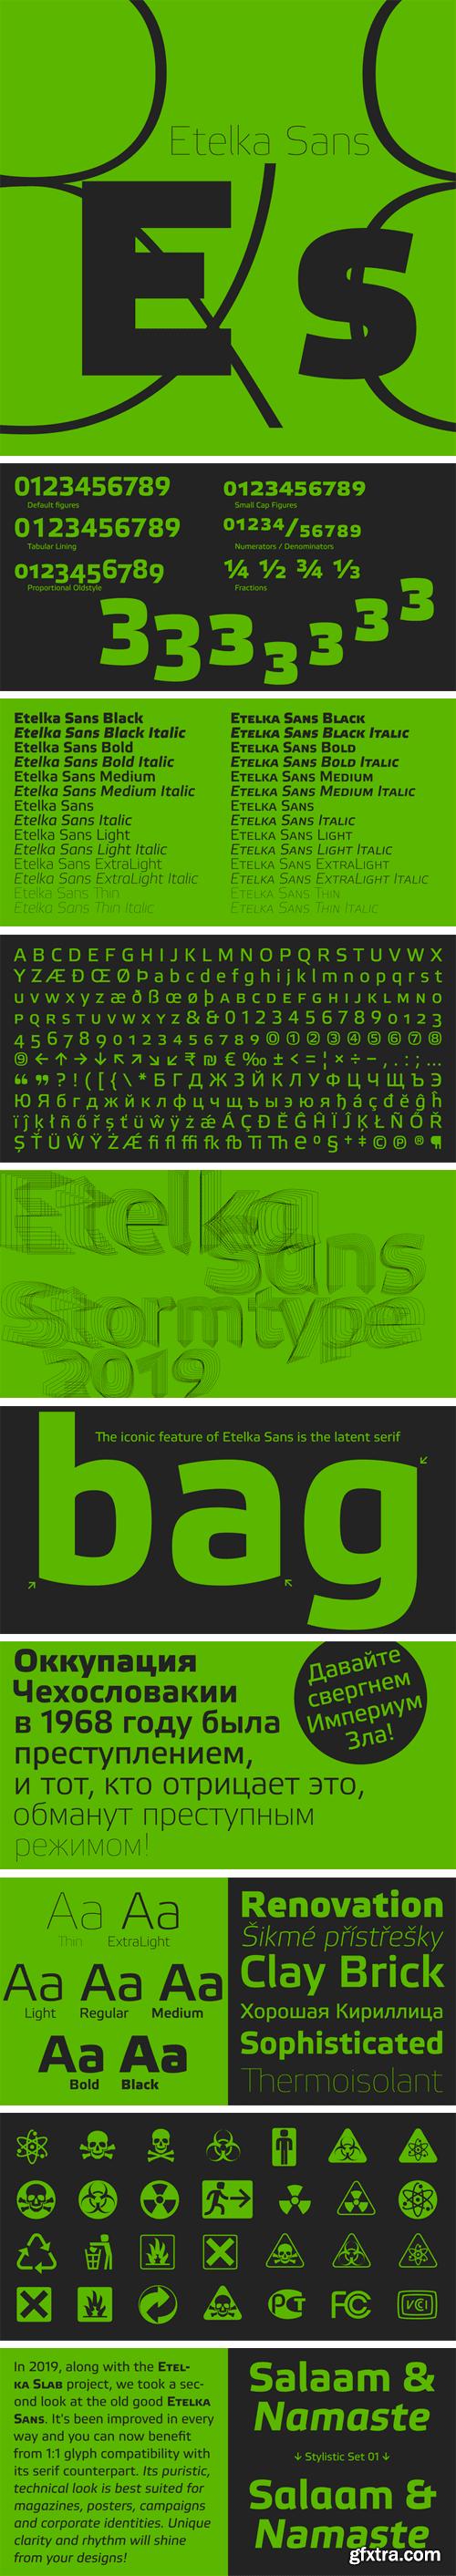 Etelka Sans Font Family (Updated 2019)